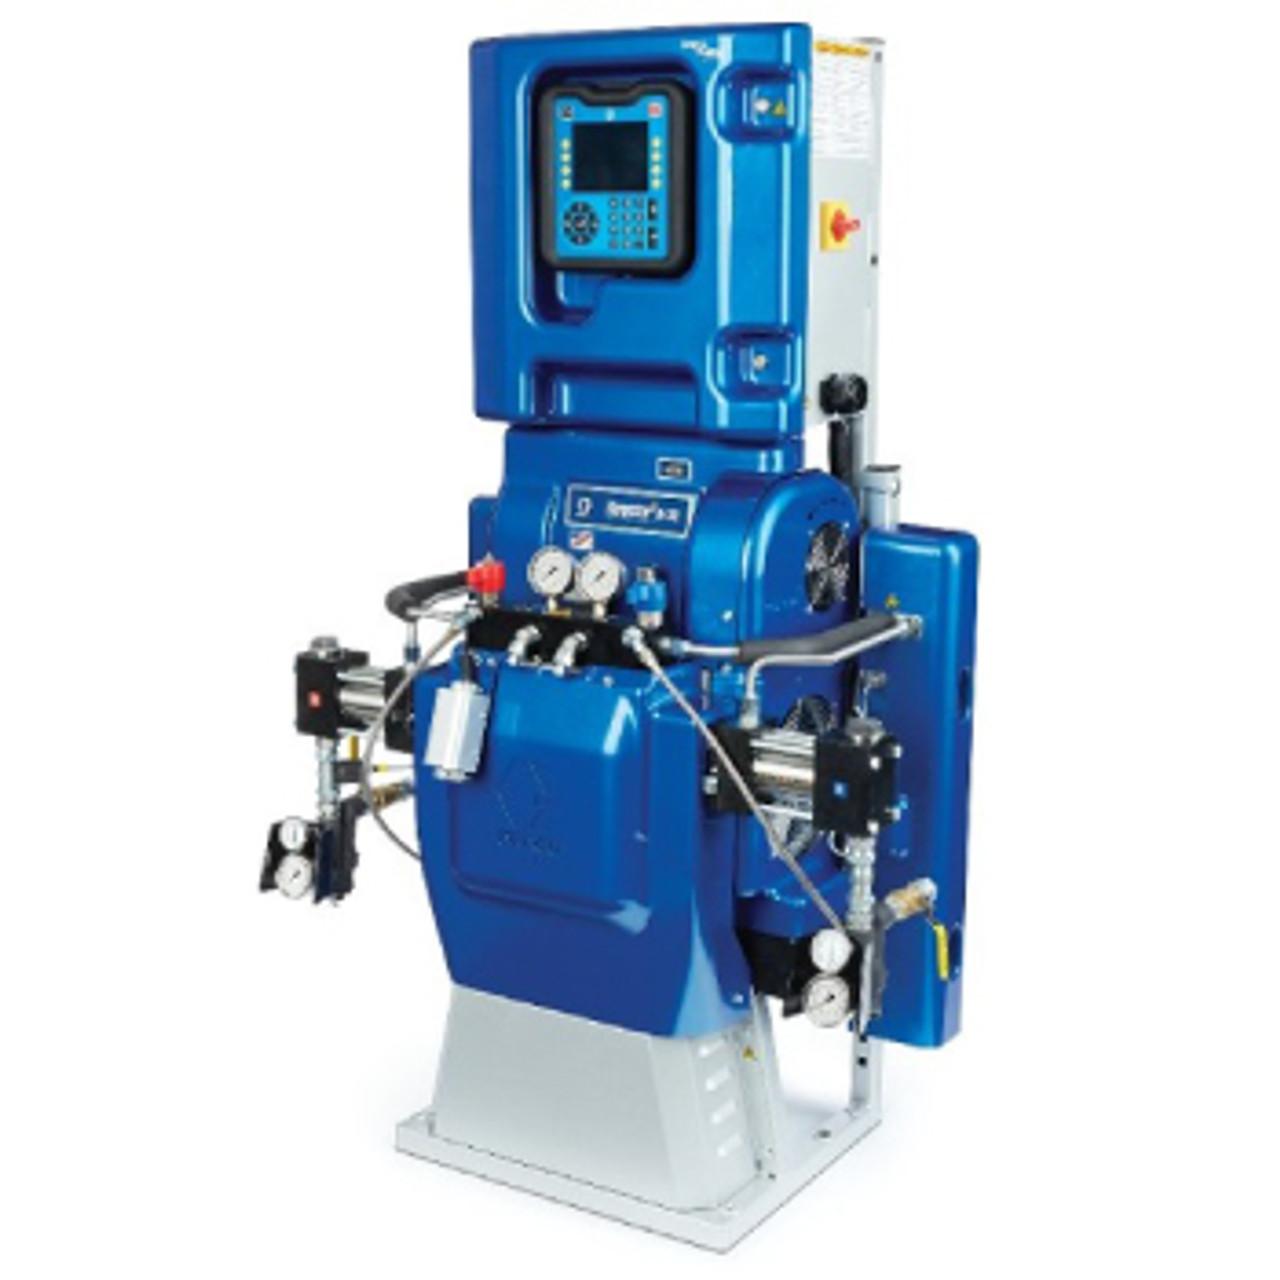 Graco Hydraulic Reactor 2 H-XP2